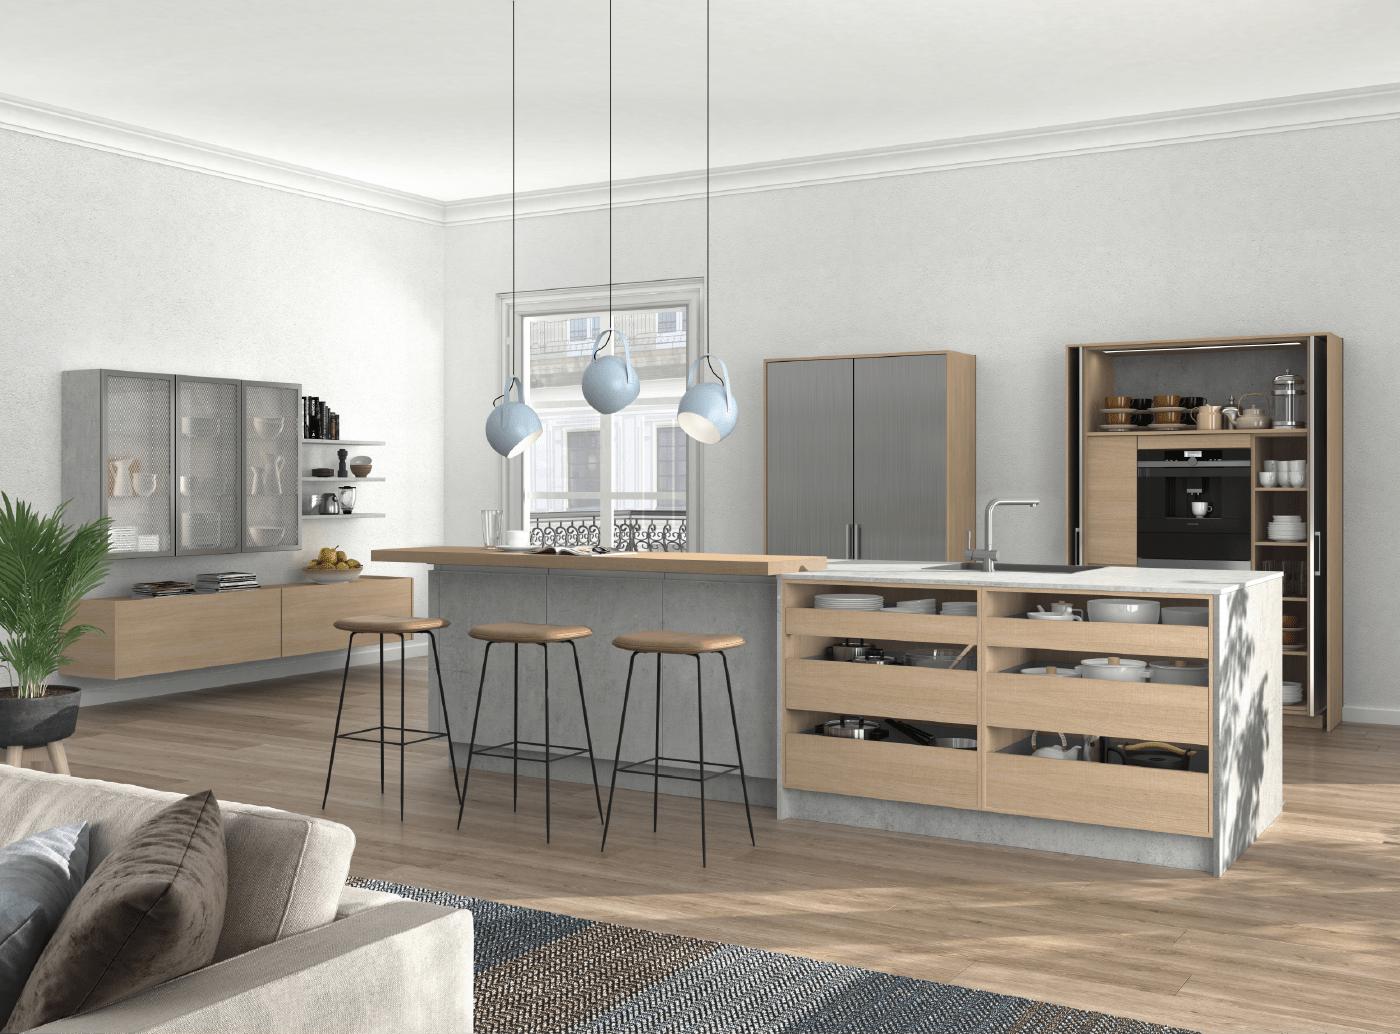 Cabeo-keukens-2-keuken-foto-8